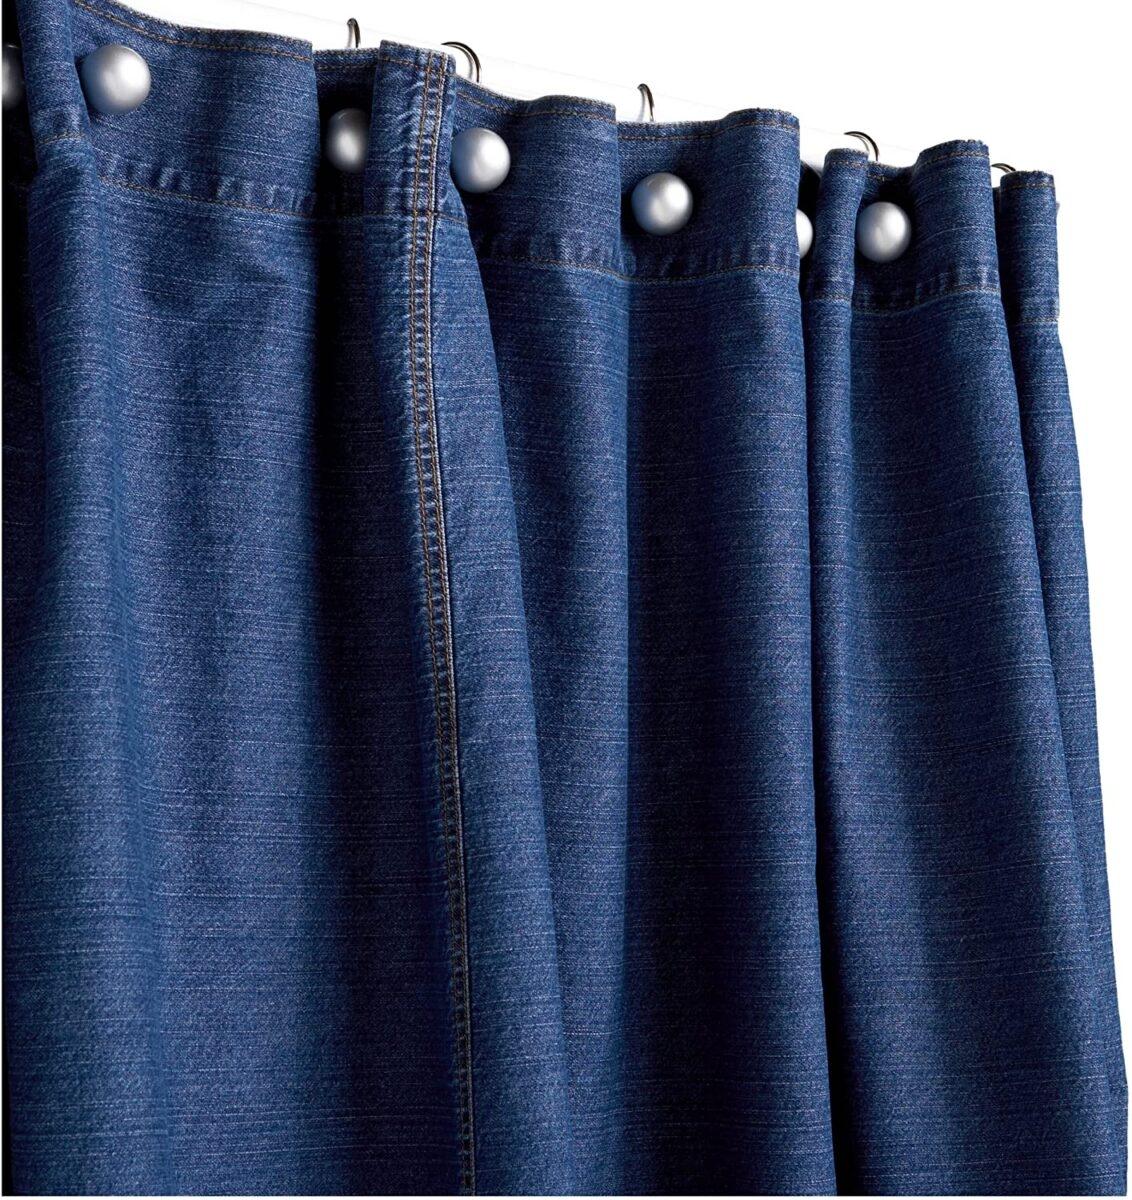 High Quality Denim Shower Curtain